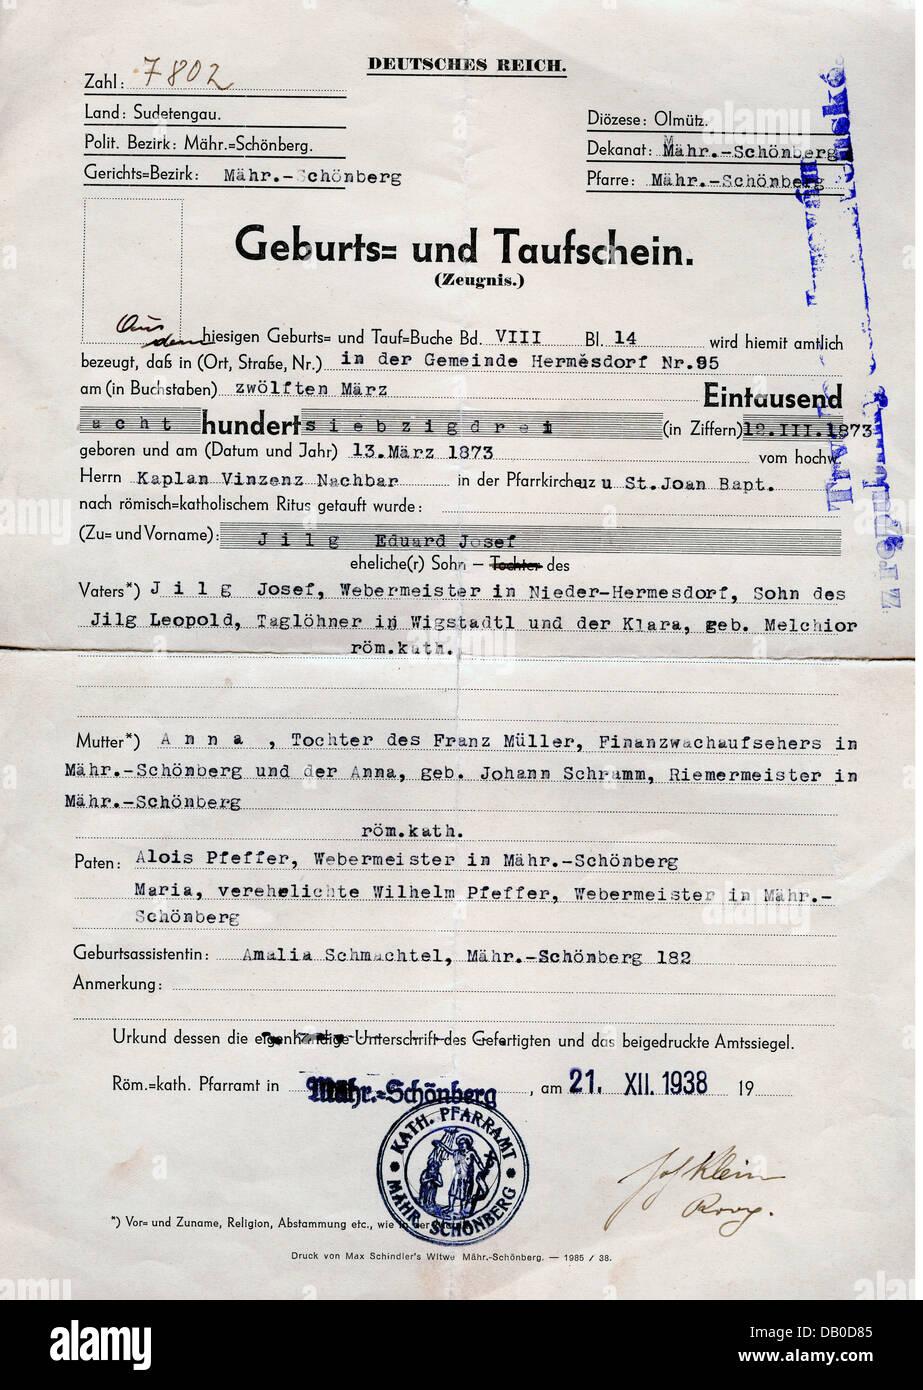 Documents Birth And Baptismal Certificate For Eduard Josef Jilg